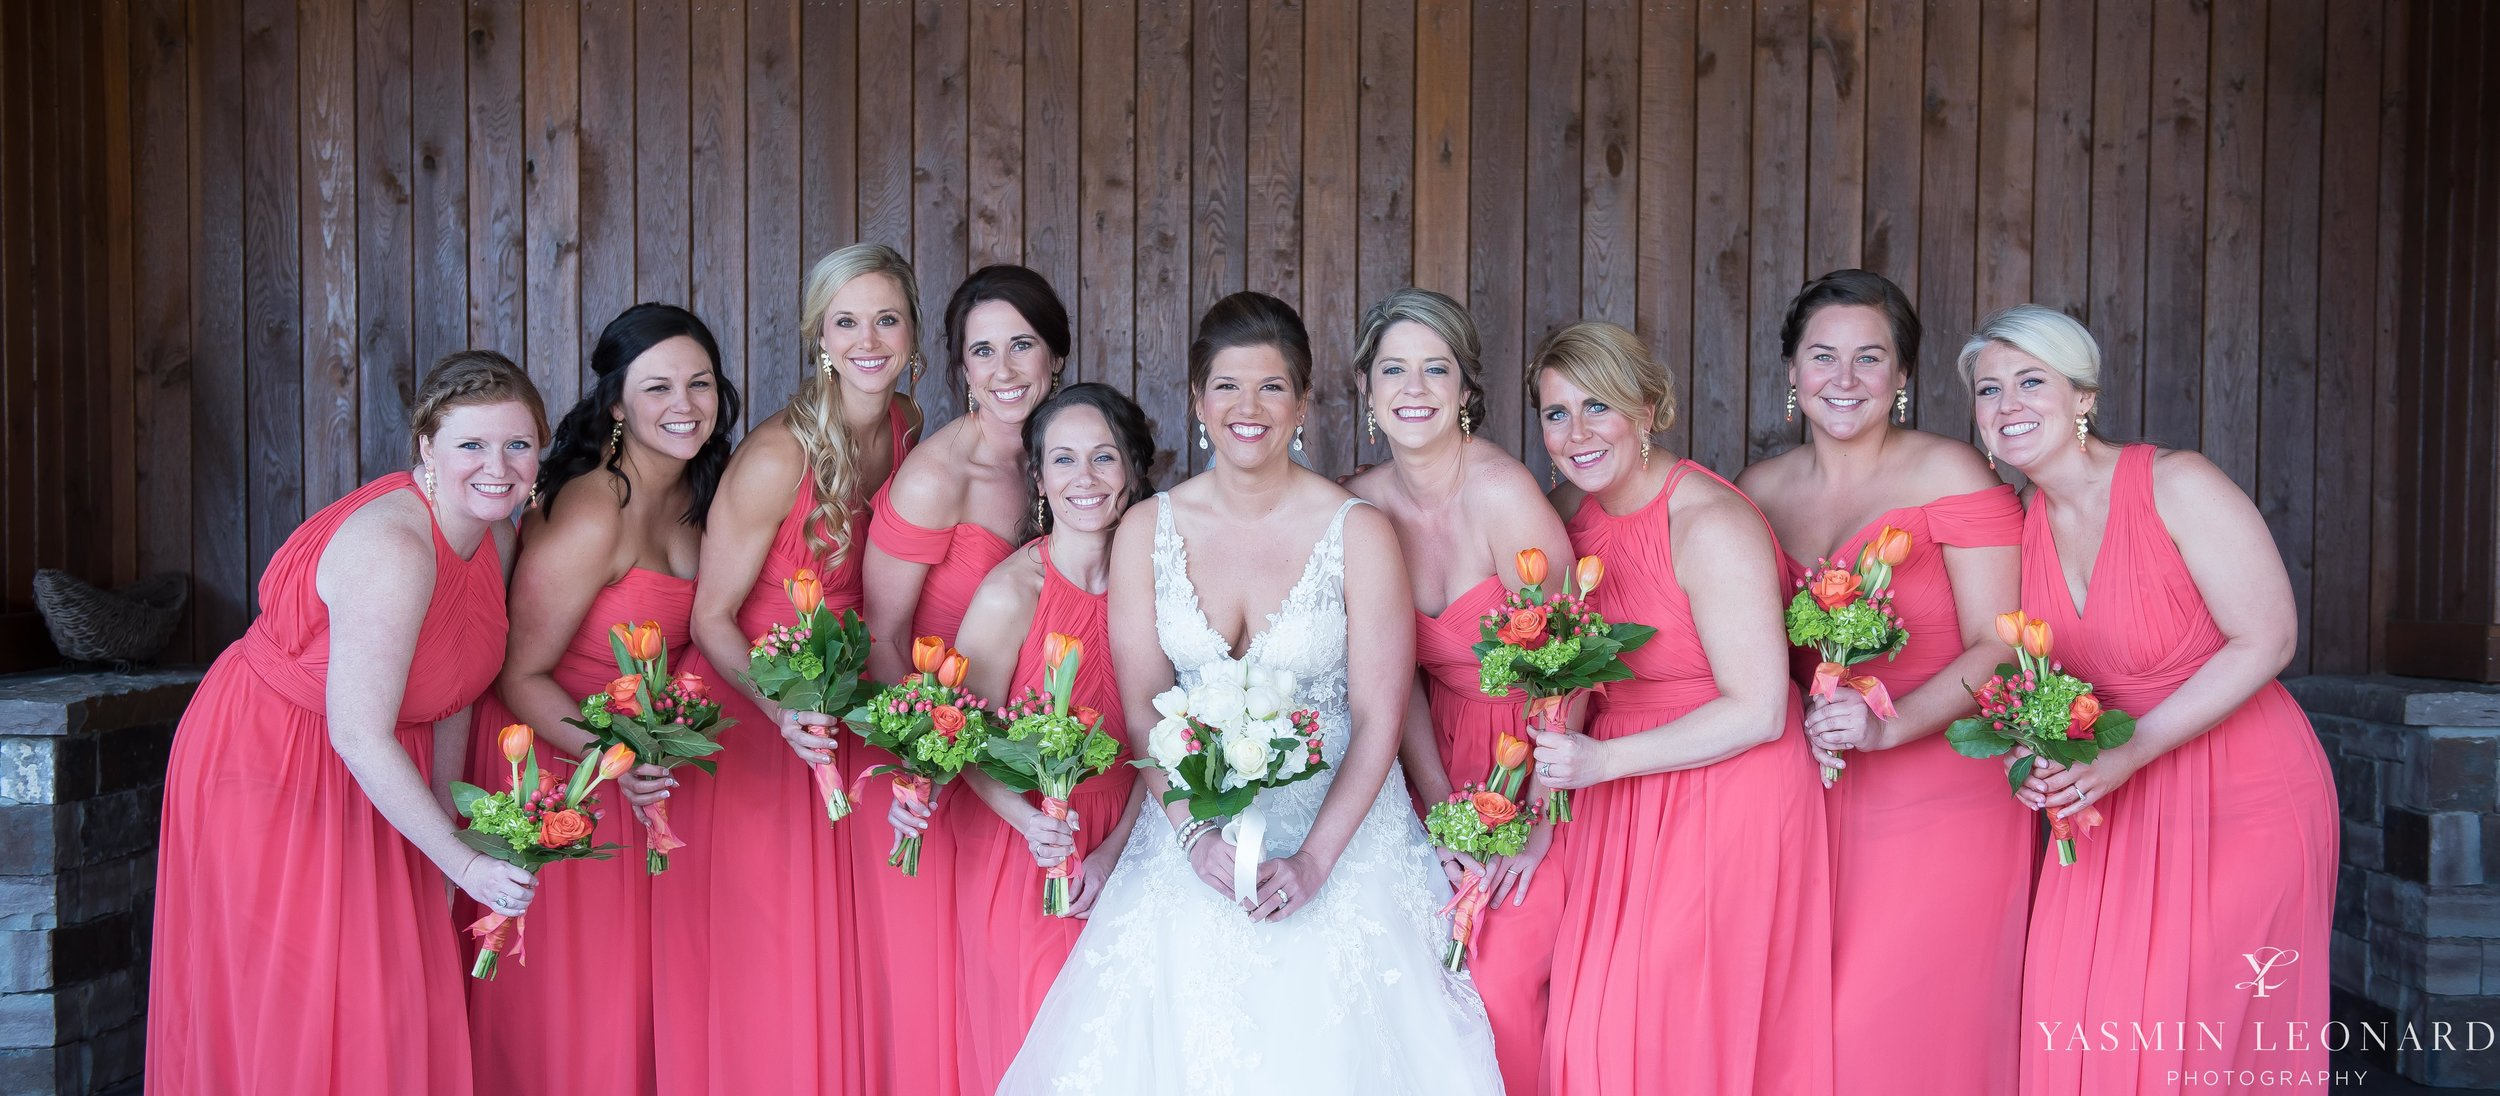 Adaumont Farm - Adaumont Farm Weddings - Trinity Weddings - NC Weddings - Yasmin Leonard Photography-17.jpg